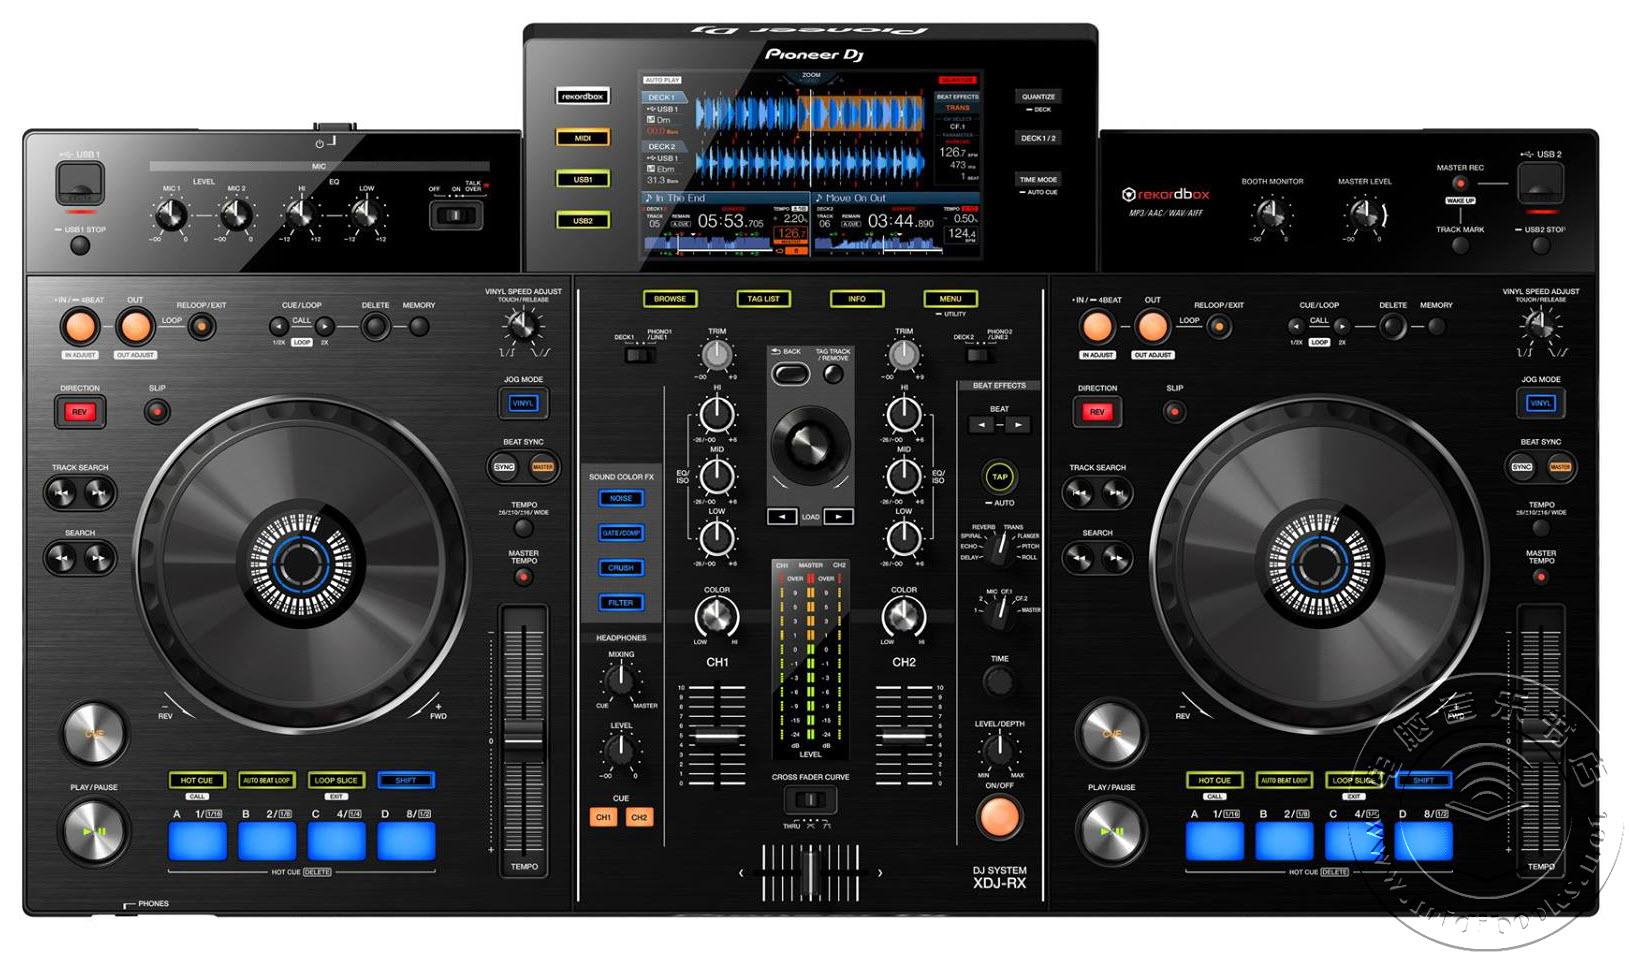 [NAMM2015]先锋(Pioneer)发布新款XDJ-RX DJ MIDI控制器(视频)